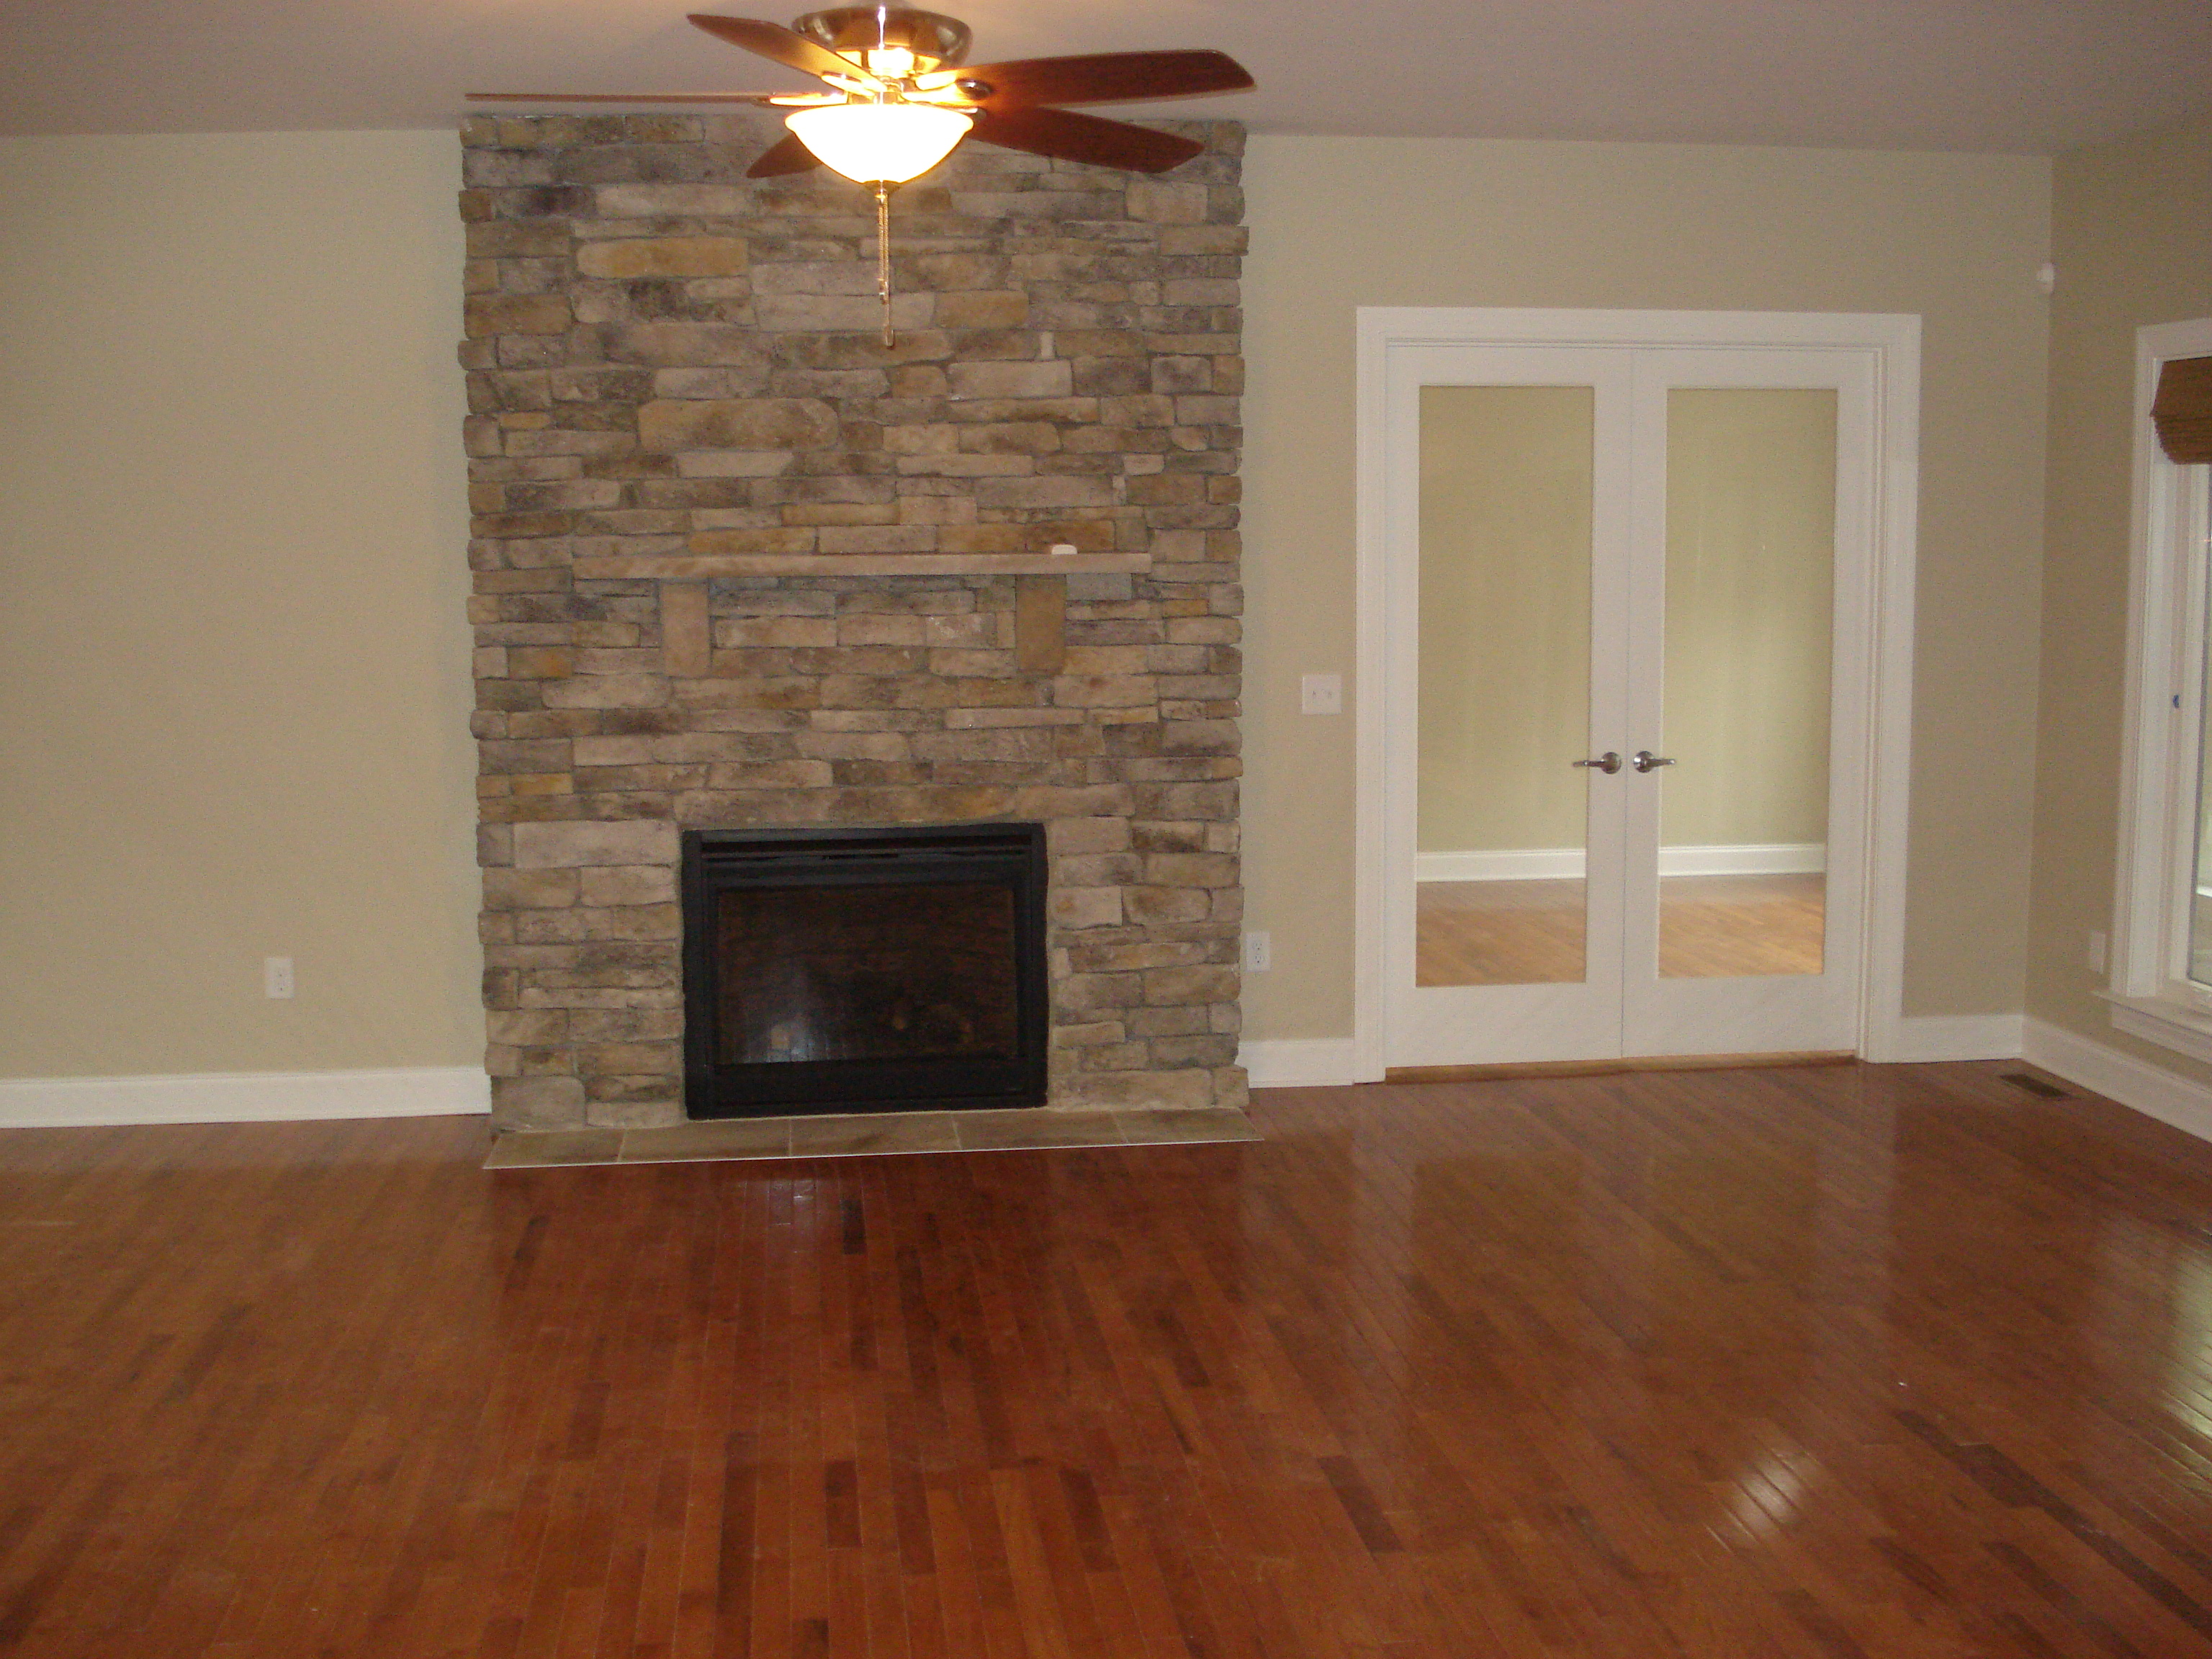 hardwood floor & fireplace